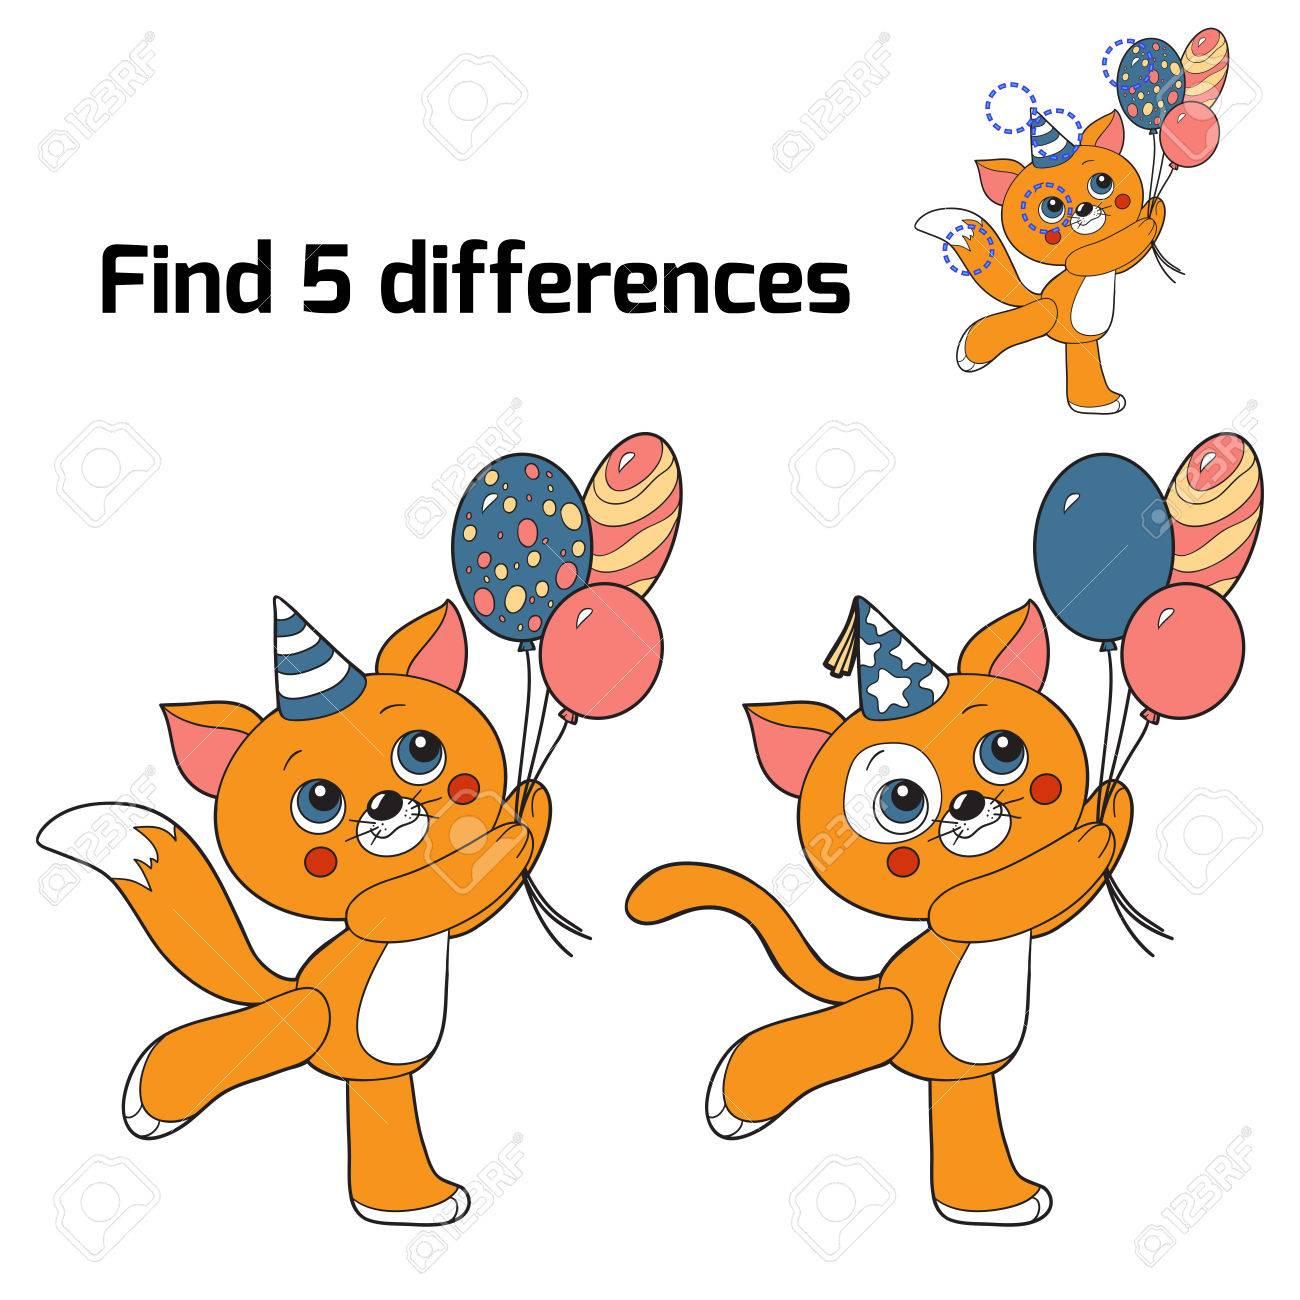 Les 5 Differences